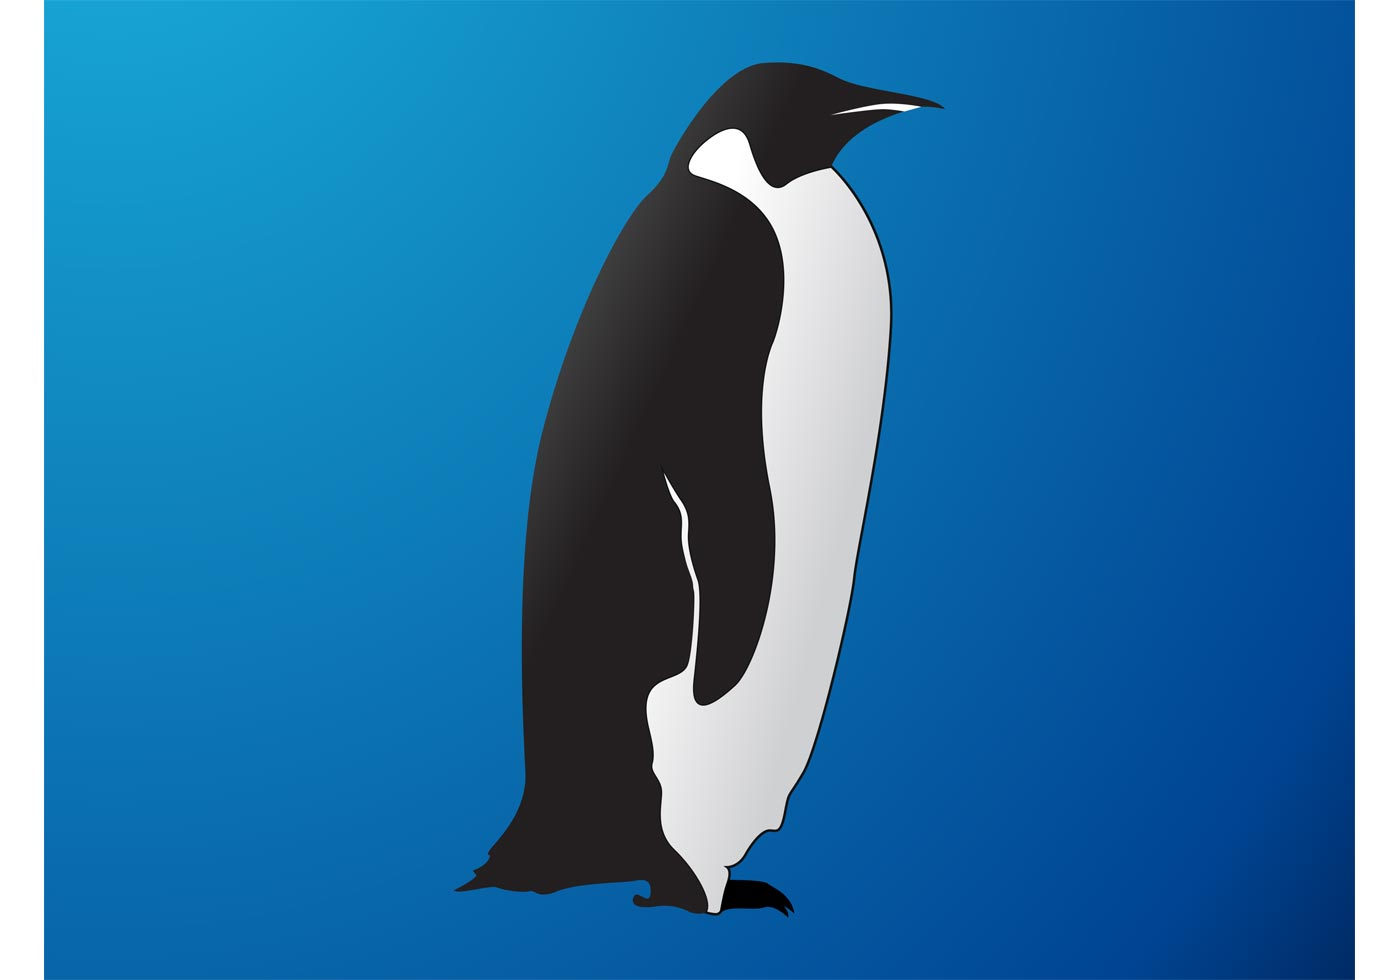 1400x980 Penguin Silhouette Free Vector Art